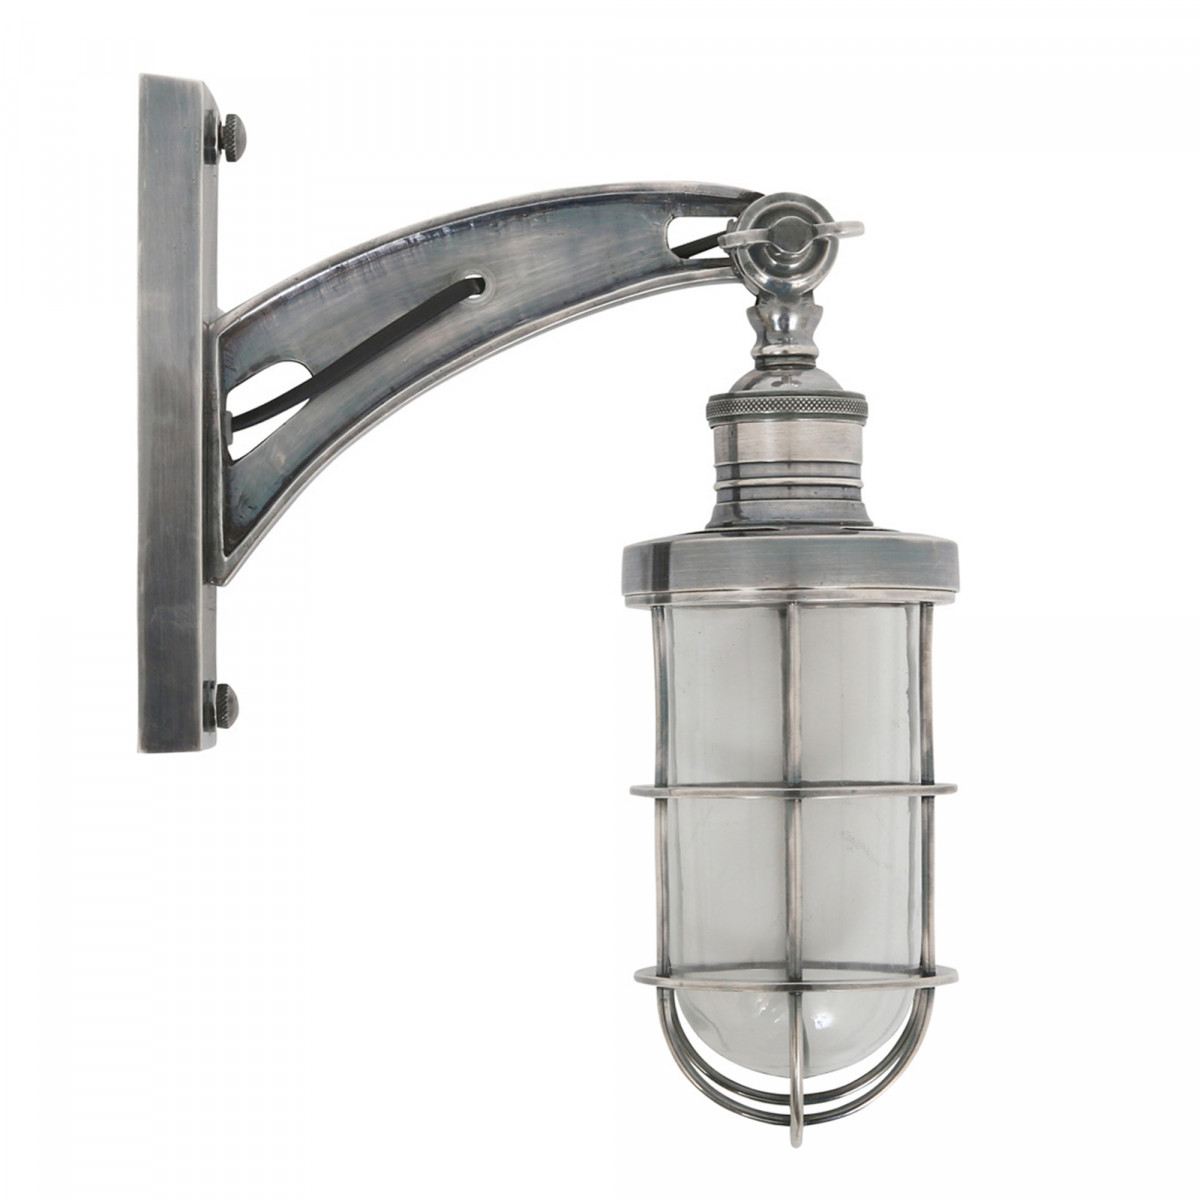 industriele wandlamp - Hudson - wandlampen industrieel design - draaibaar - Nostalux